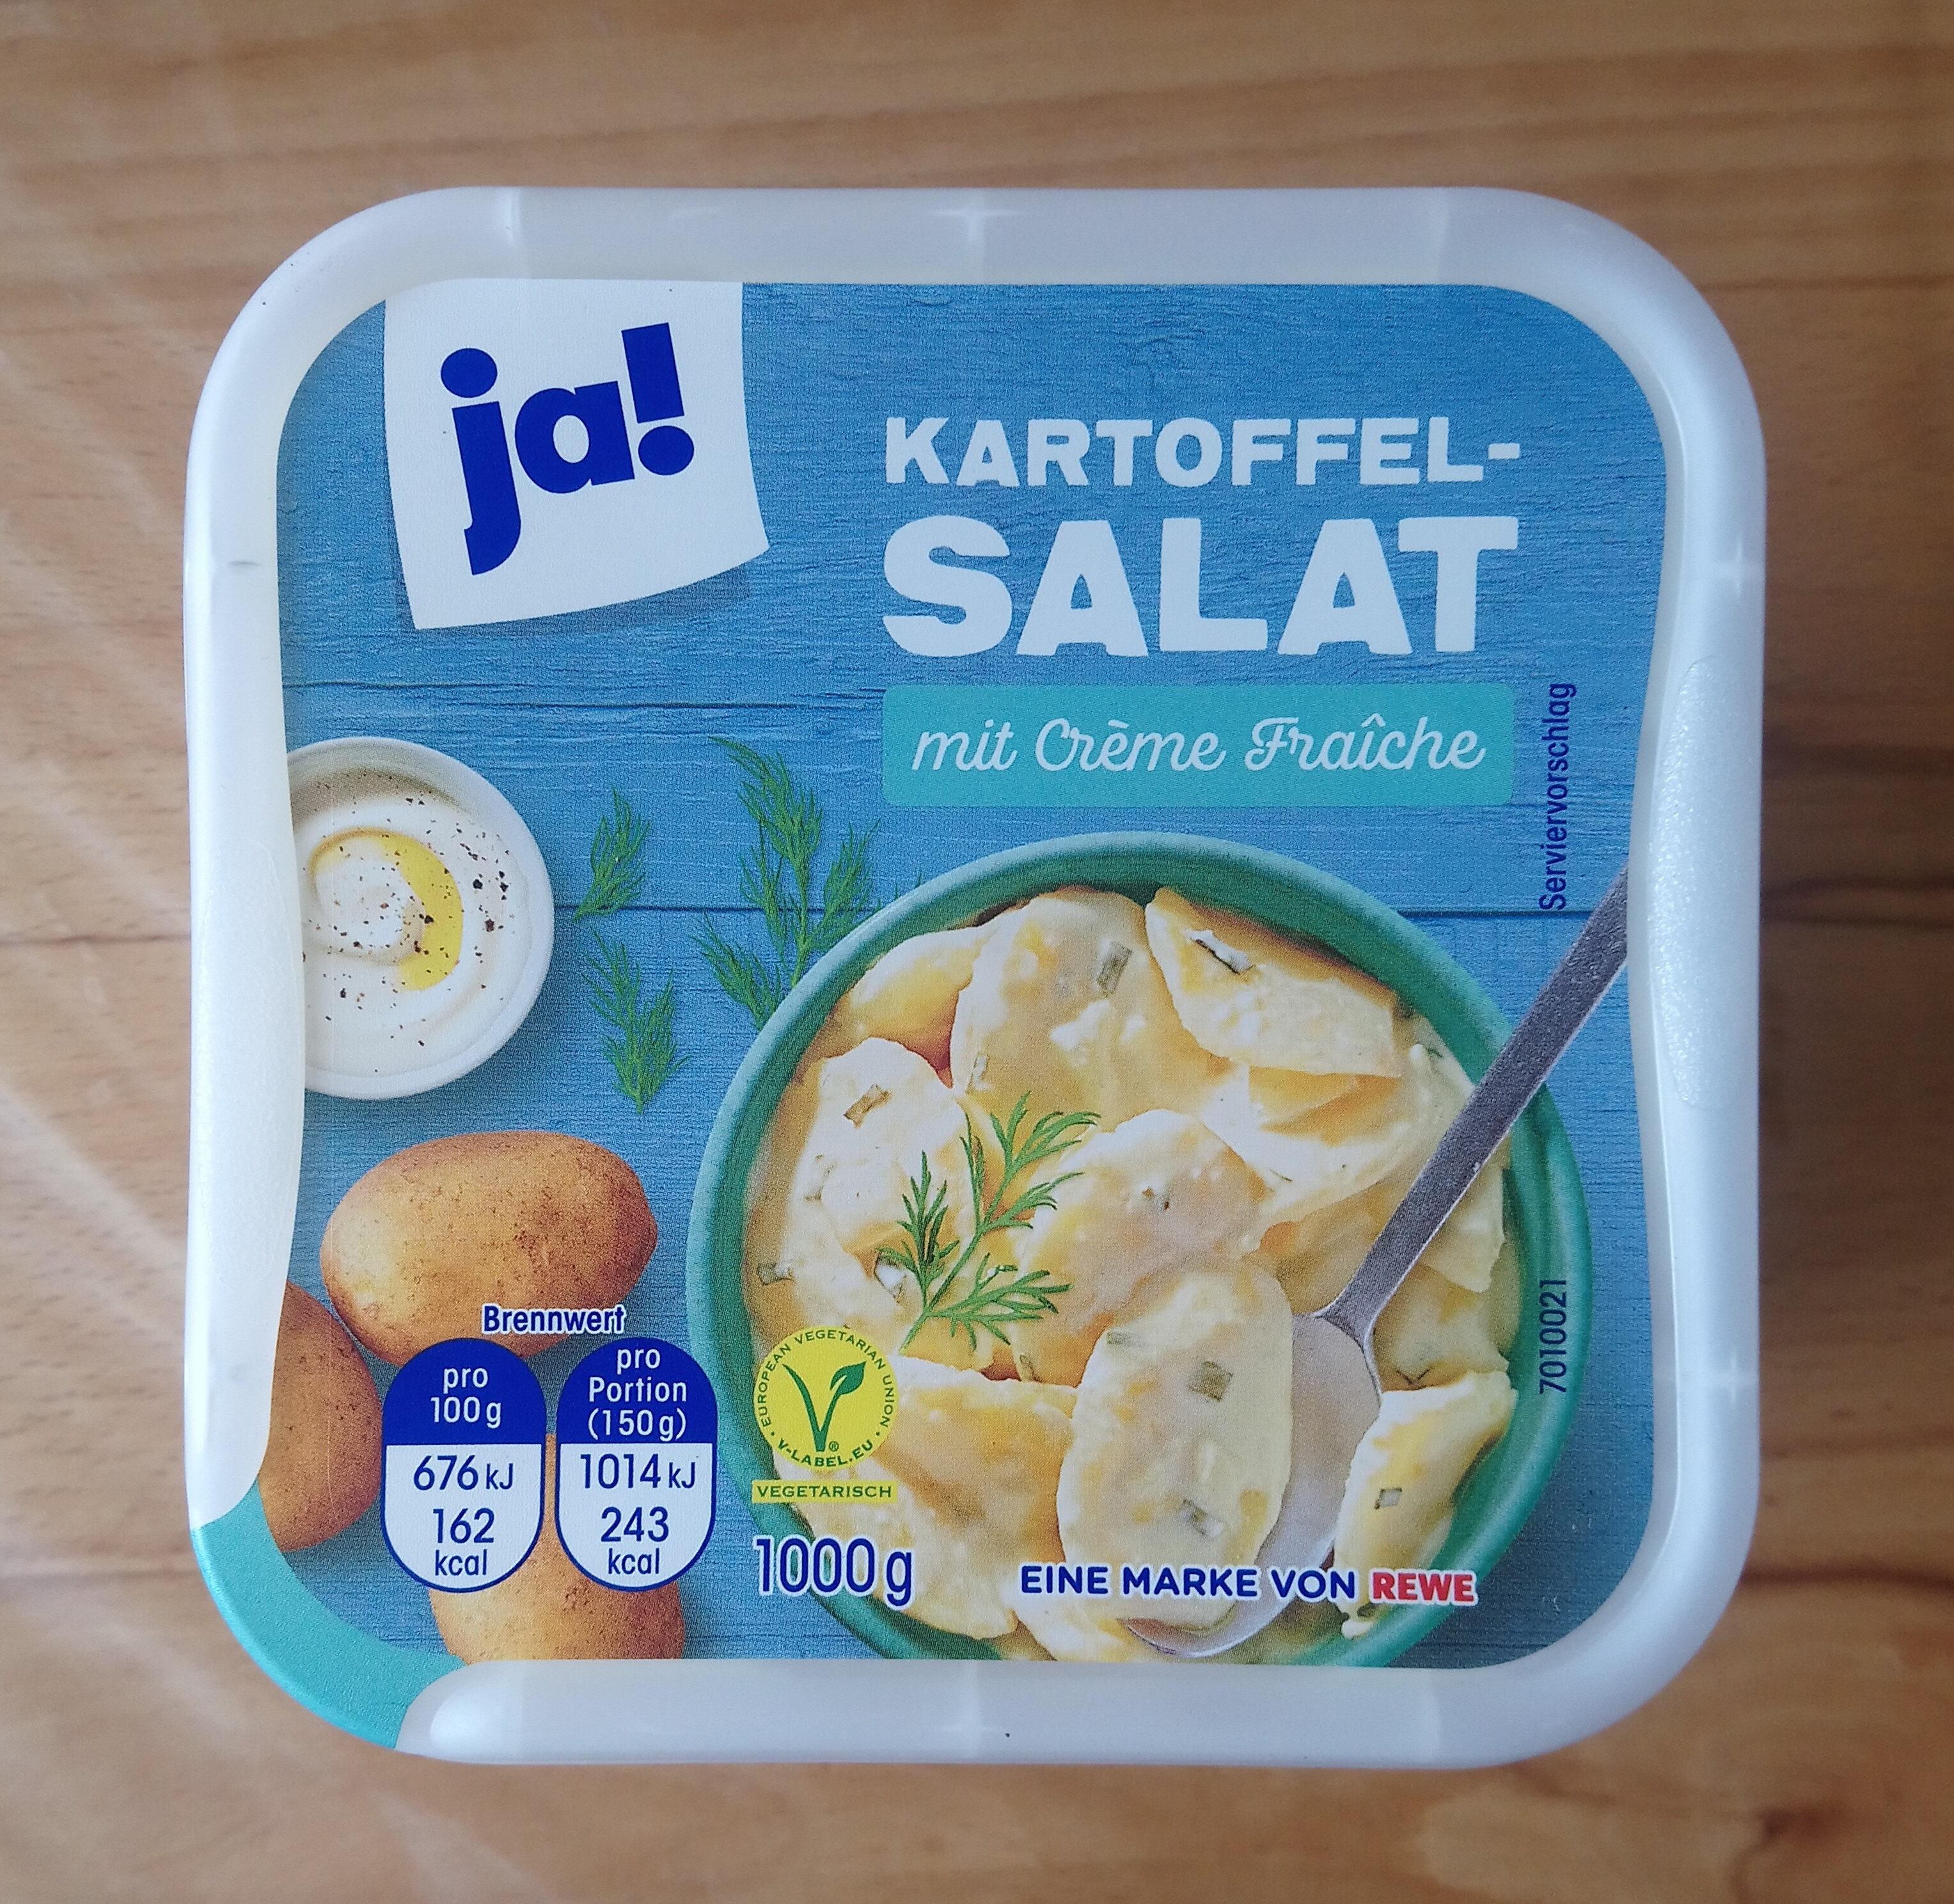 Kartoffelsalat - Product - de